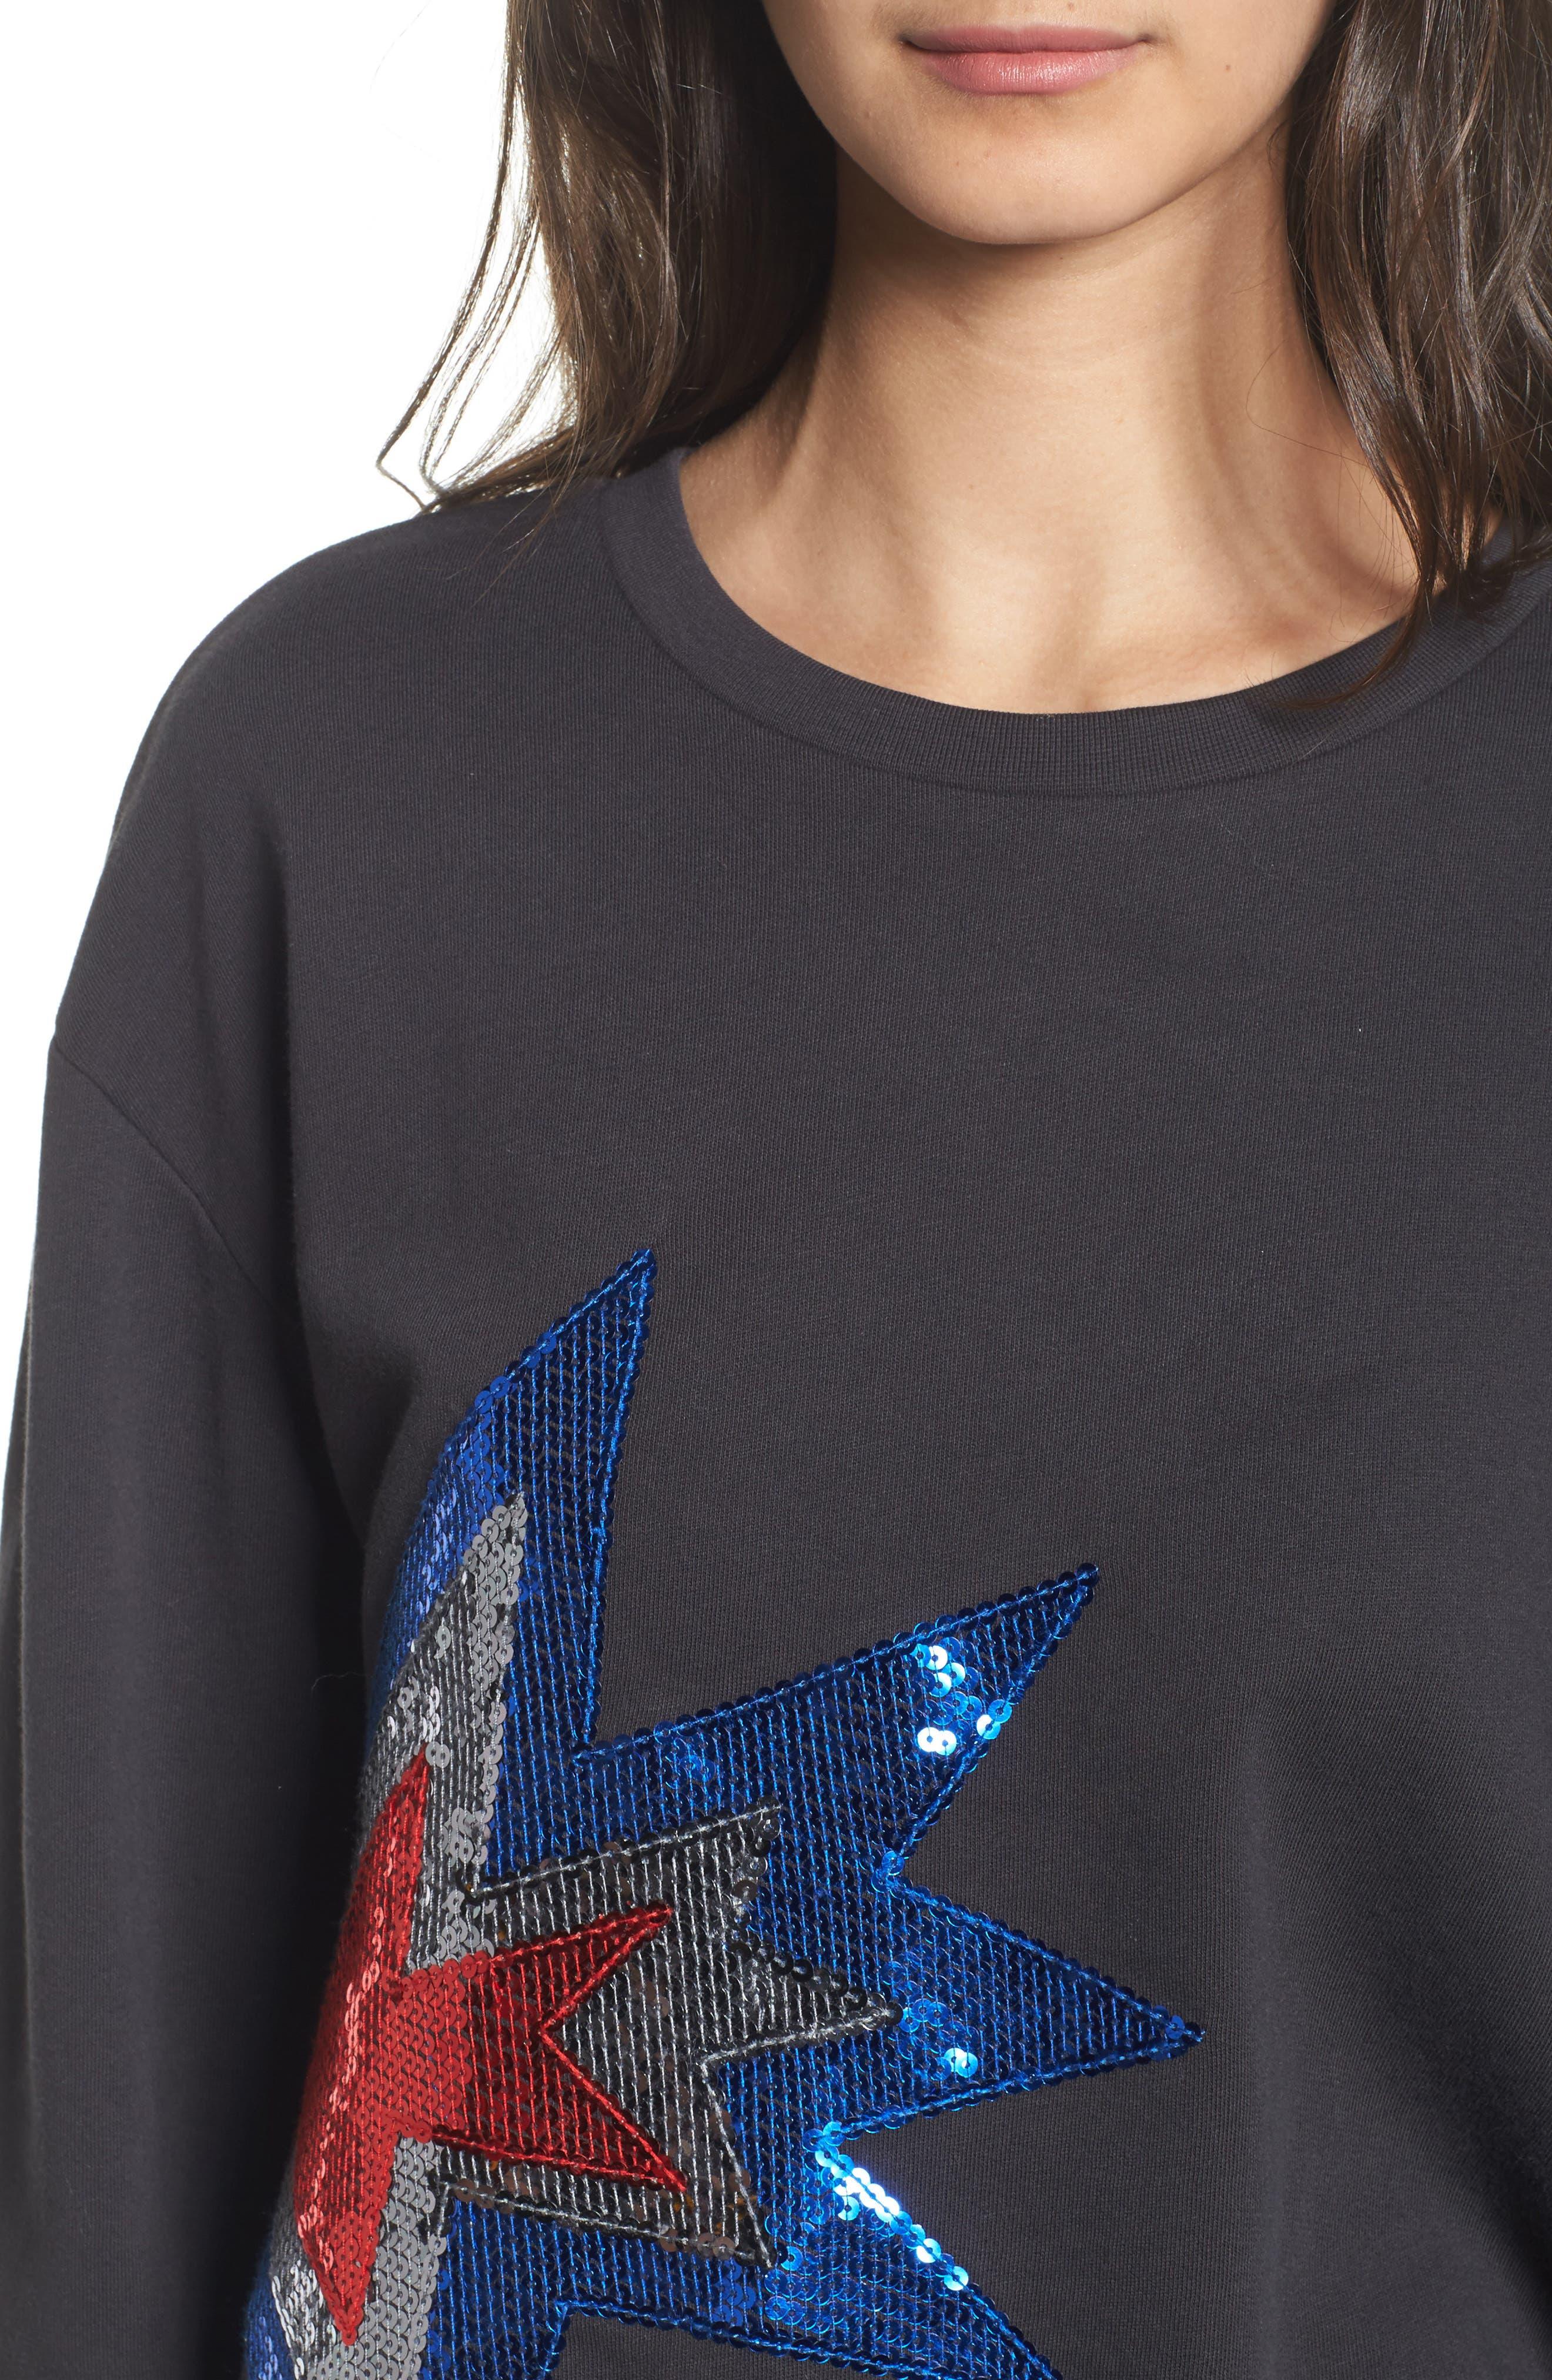 Alexa - Splash Sweatshirt,                             Alternate thumbnail 4, color,                             001